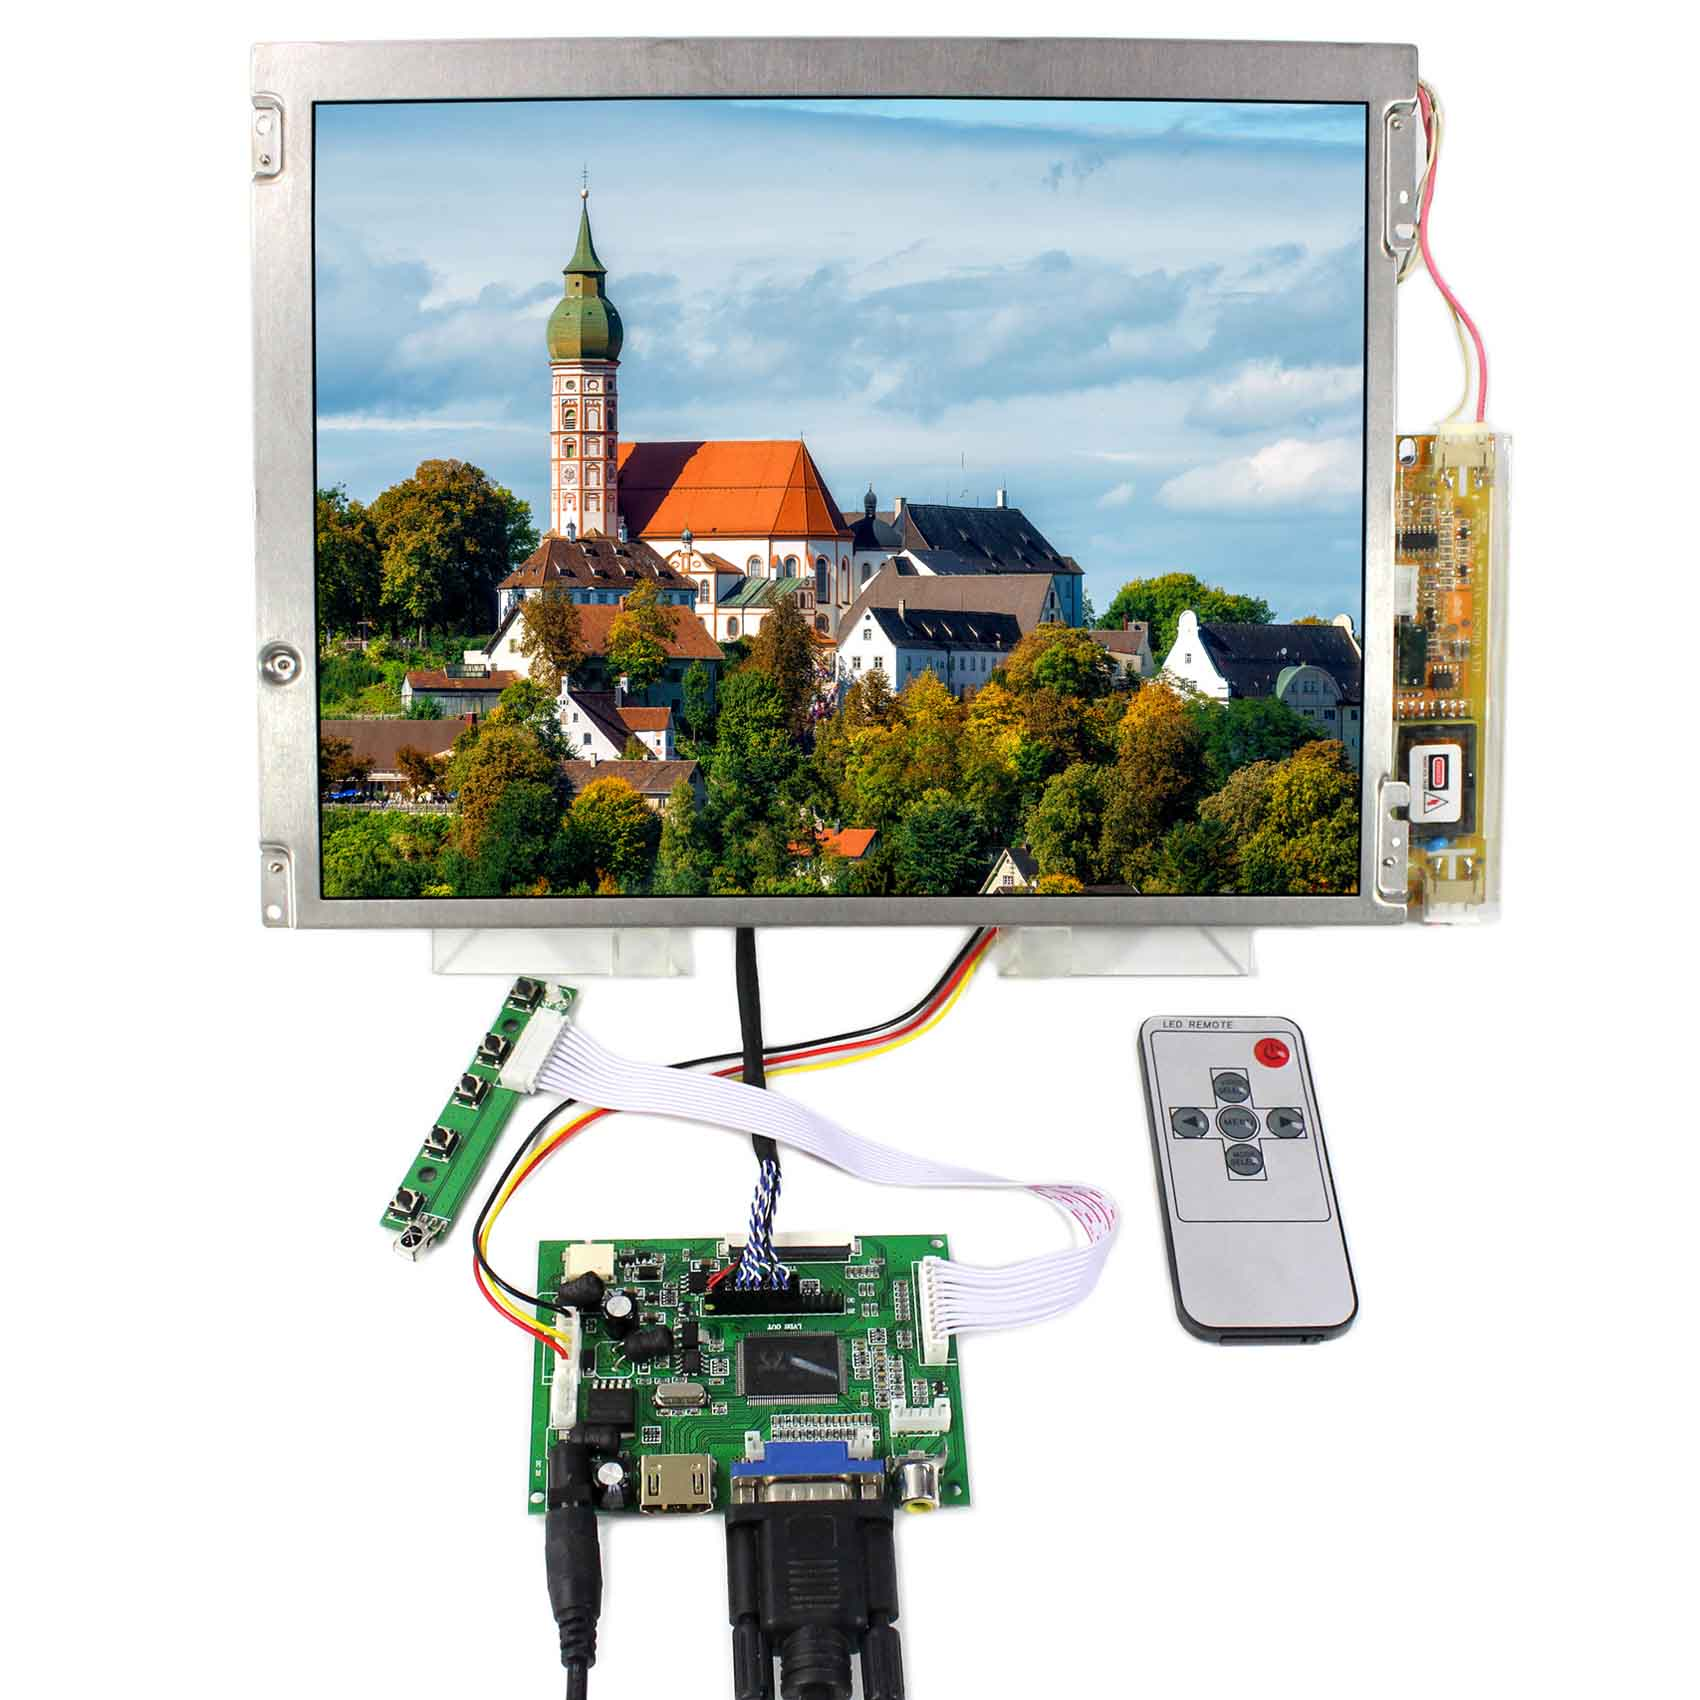 HDMI VGA 2AV lcd controller board with 12.1inch LQ121S1LG45 LQ121S1LG55 800x600 2 CCFL lcd panelHDMI VGA 2AV lcd controller board with 12.1inch LQ121S1LG45 LQ121S1LG55 800x600 2 CCFL lcd panel